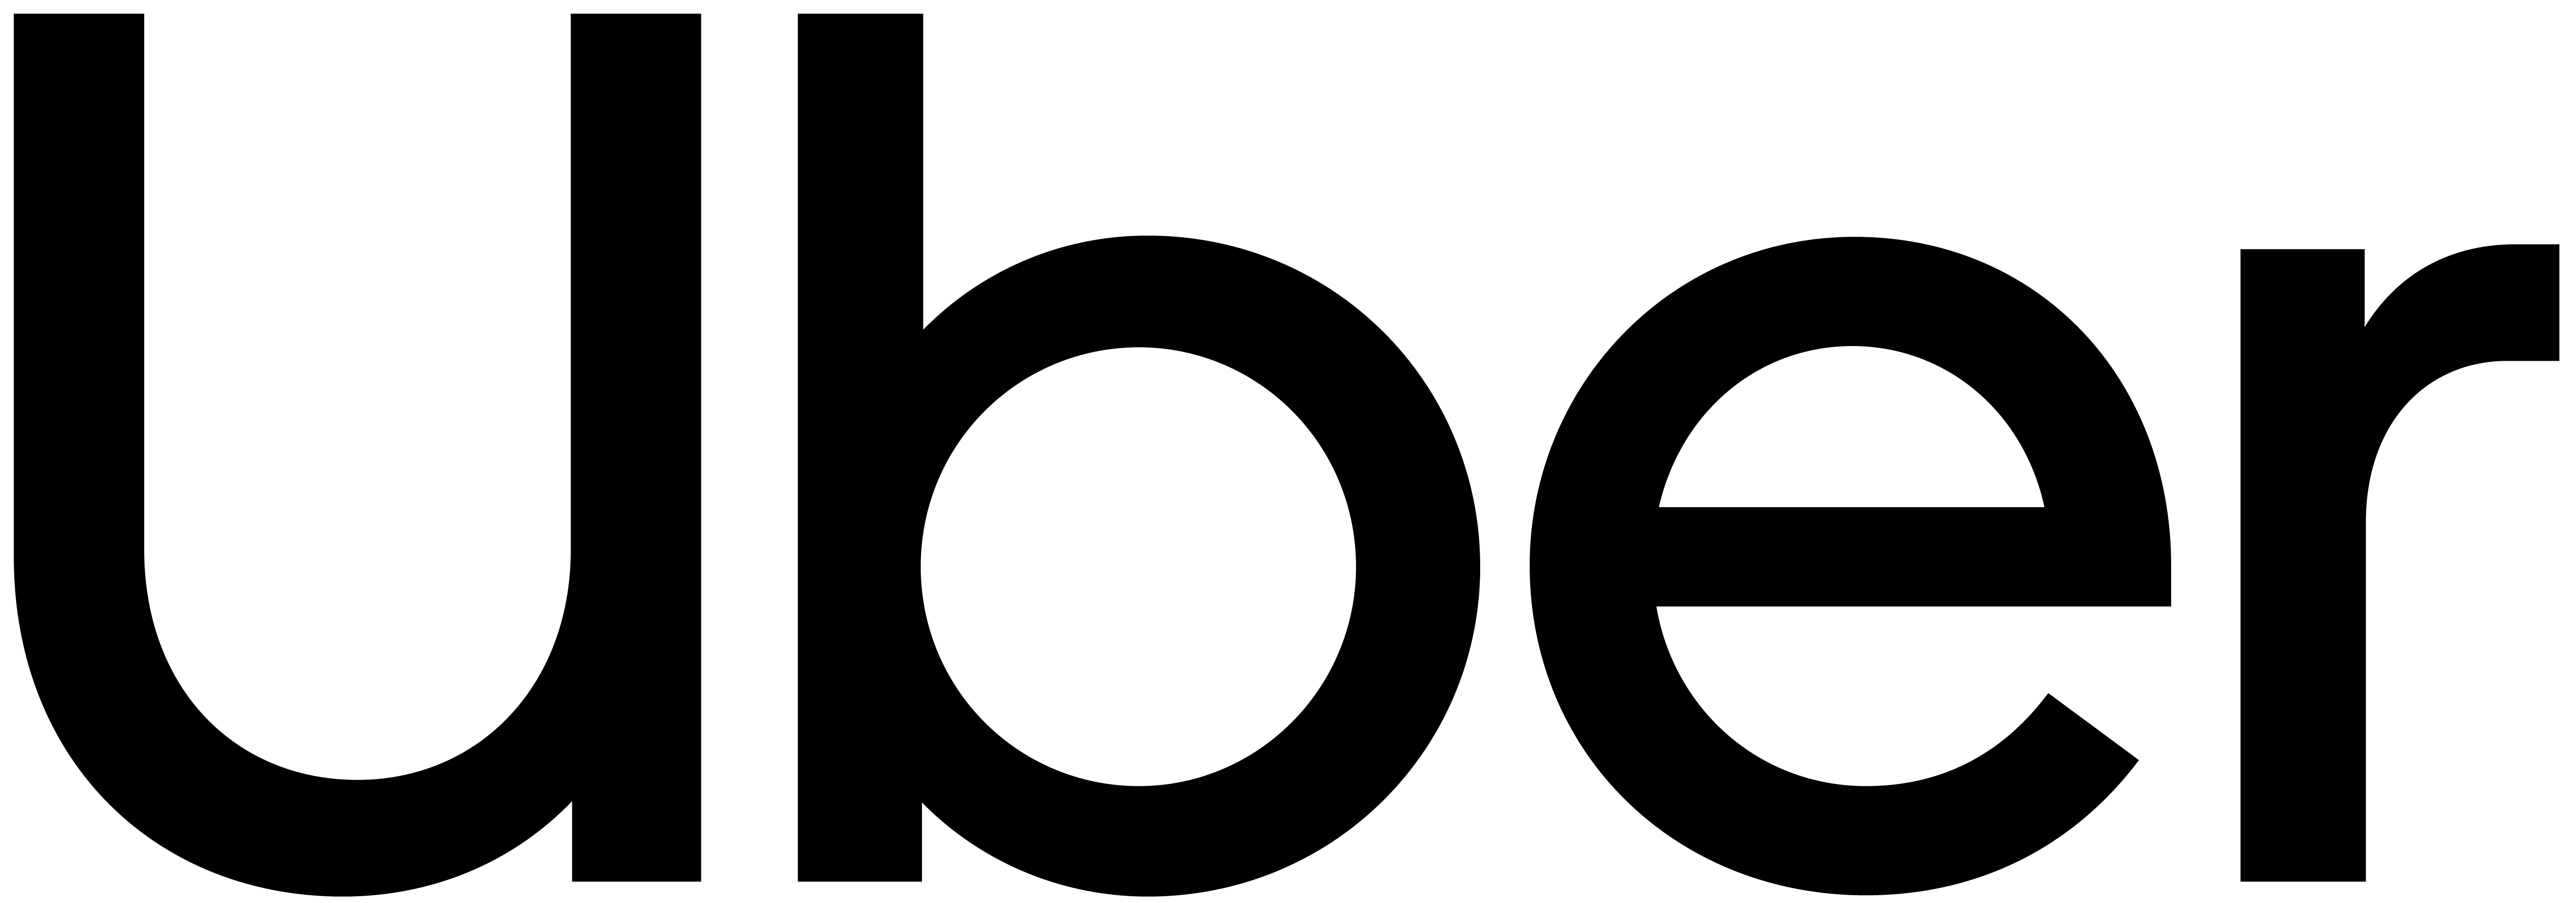 logo startup uber